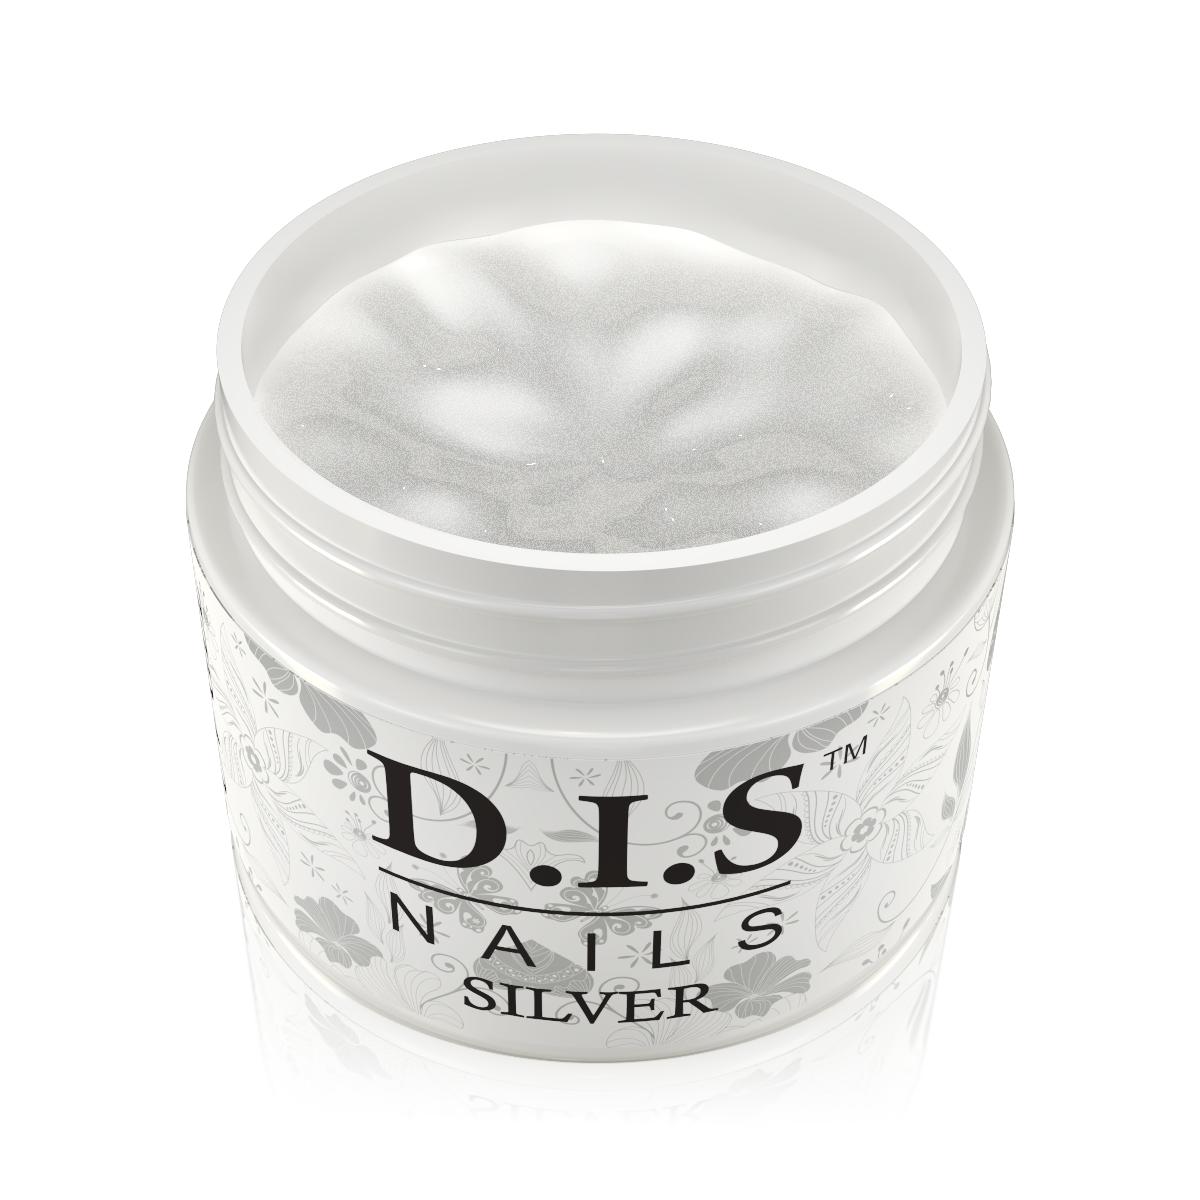 Однофазный гель D.I.S Nails Silver (серебро)  30 гр.